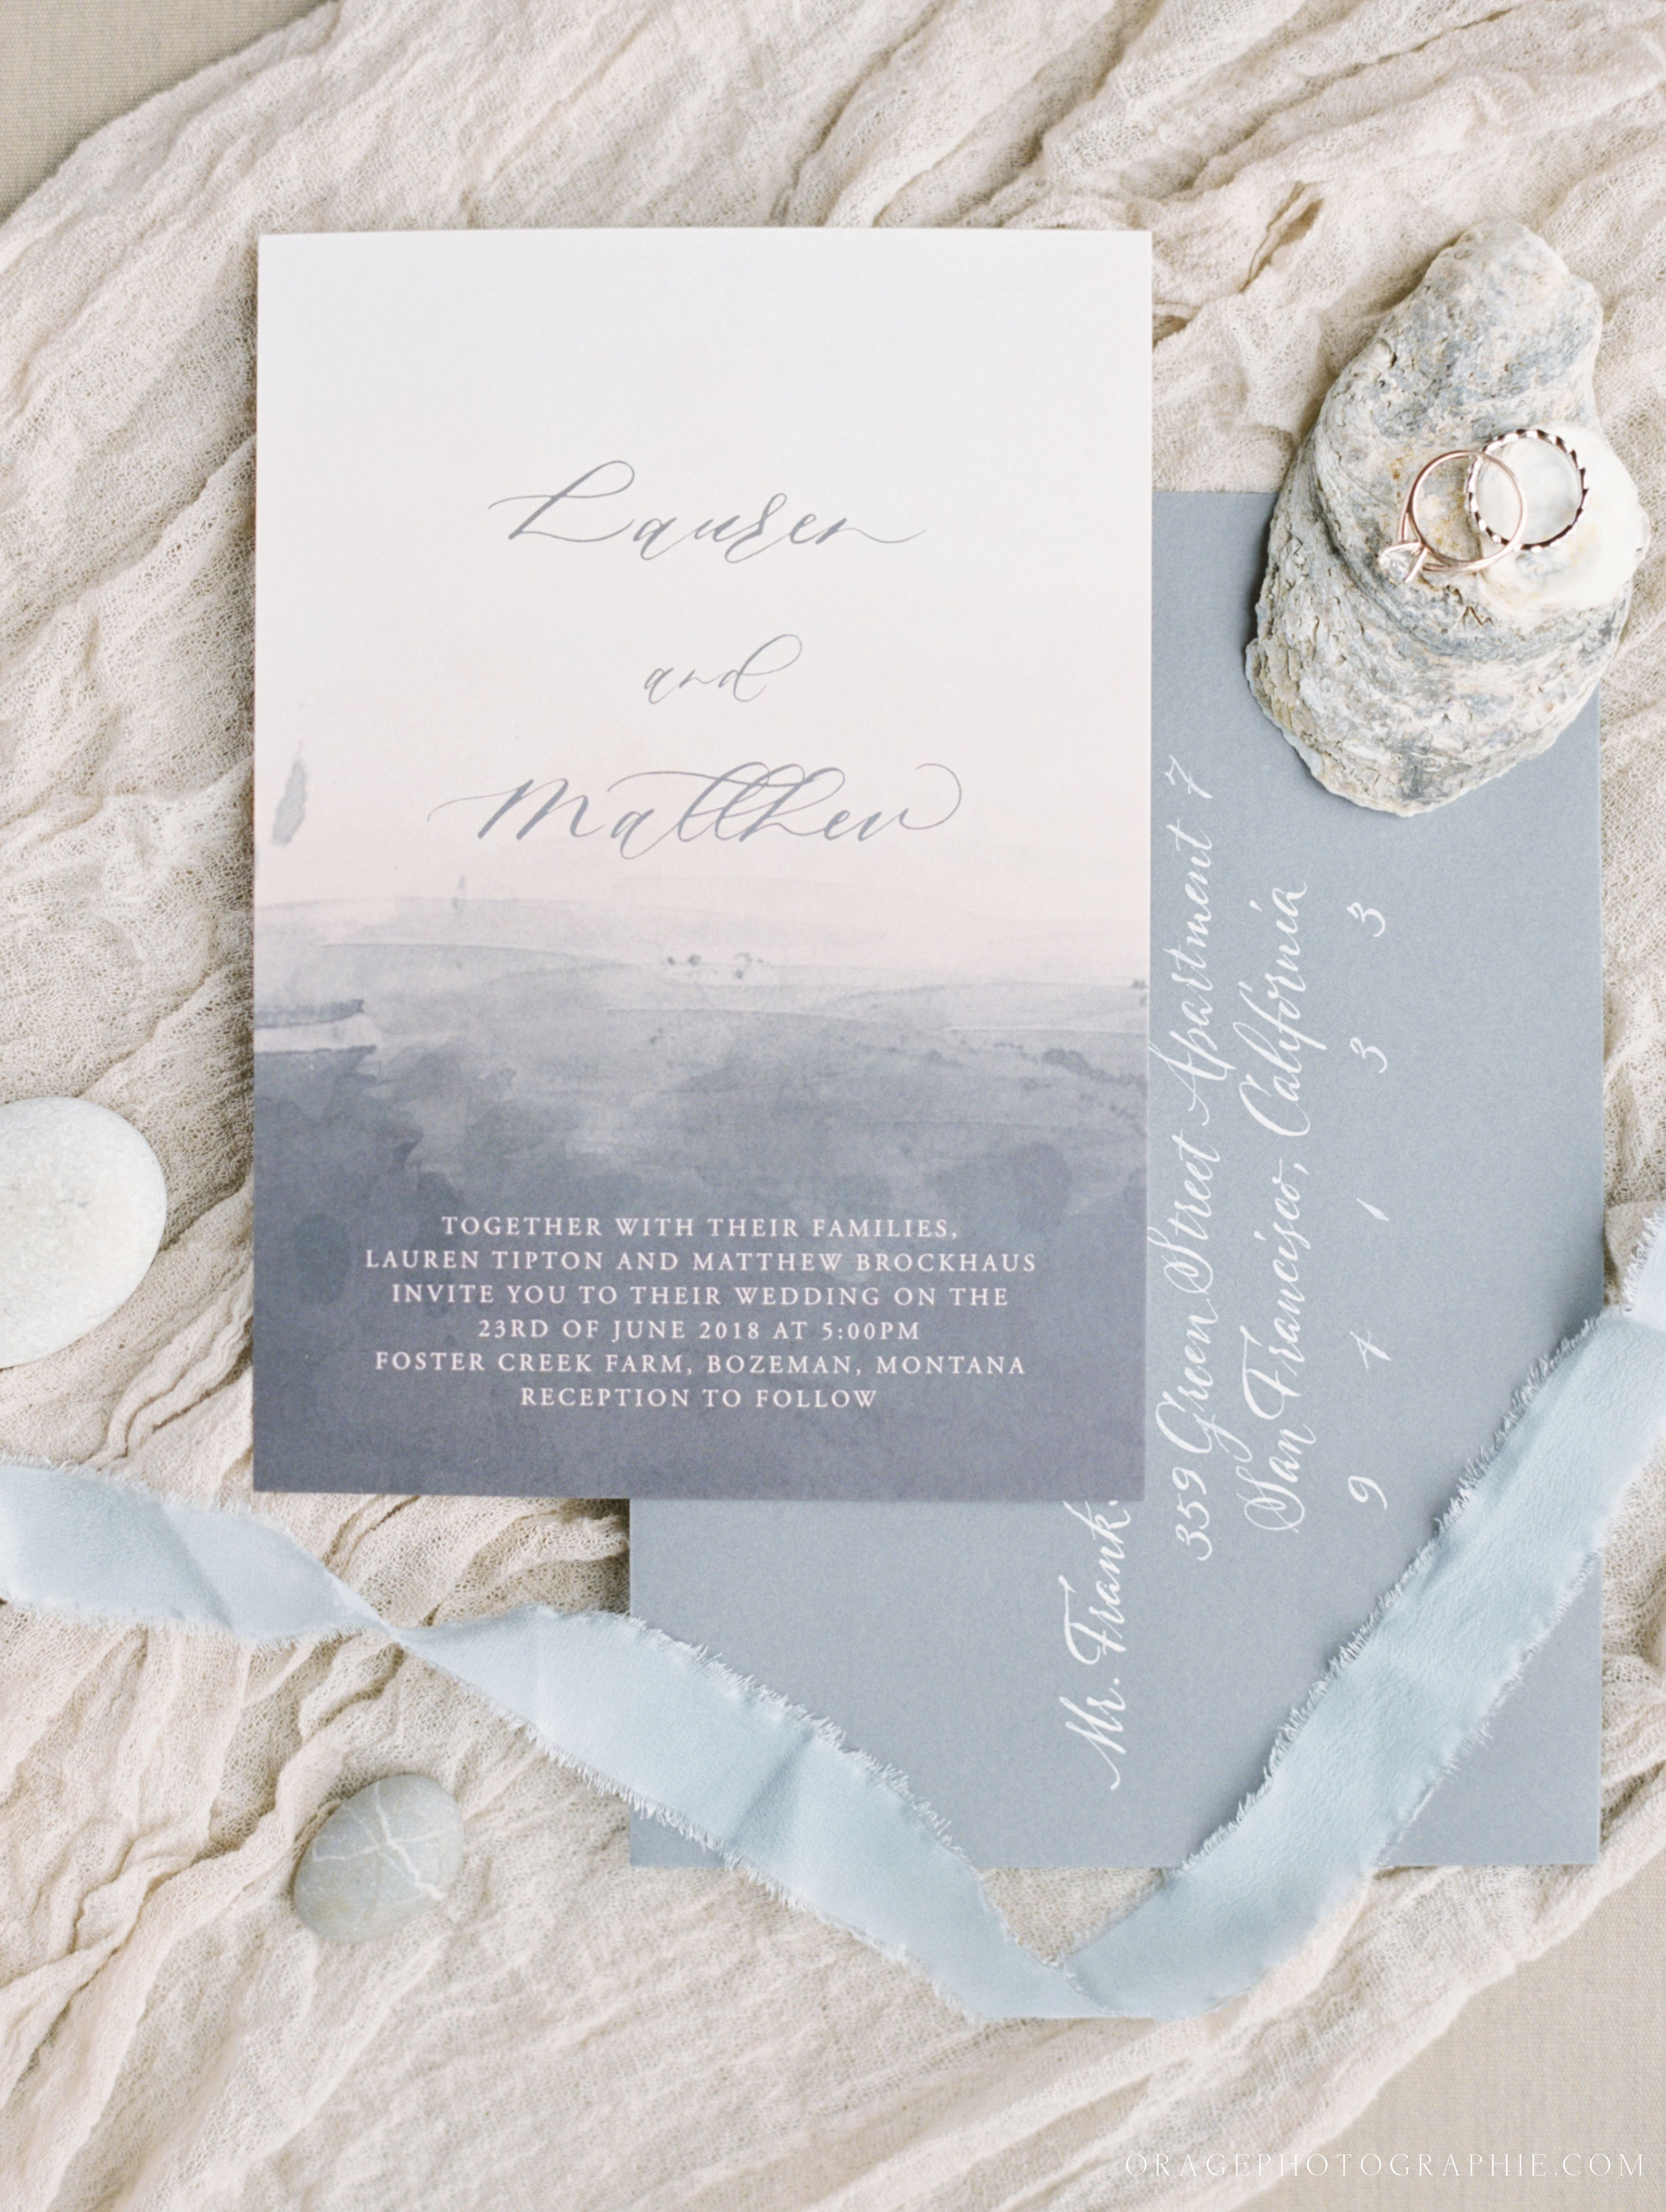 Watercolor illustration wedding invitation